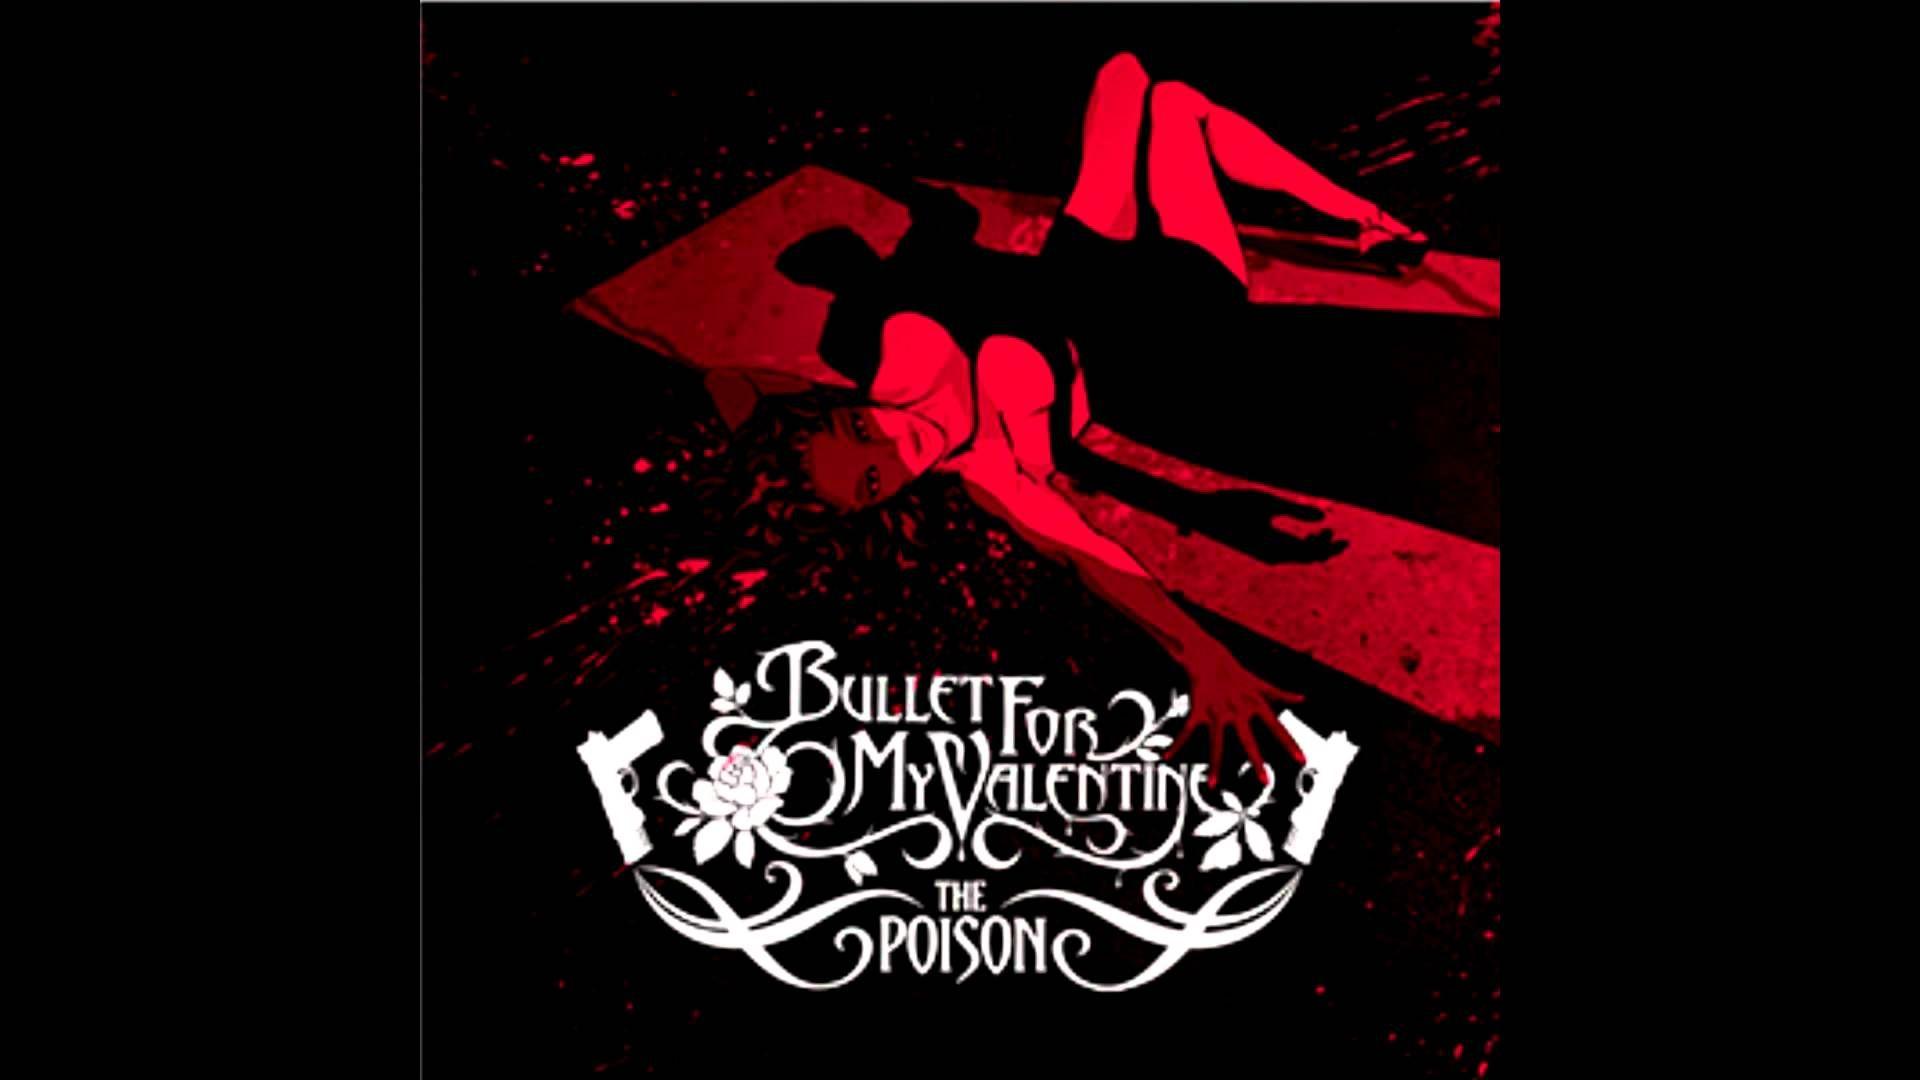 Bullet For My Valentine The Poison Bullet For My Valentine Valentine Songs Valentine Fun